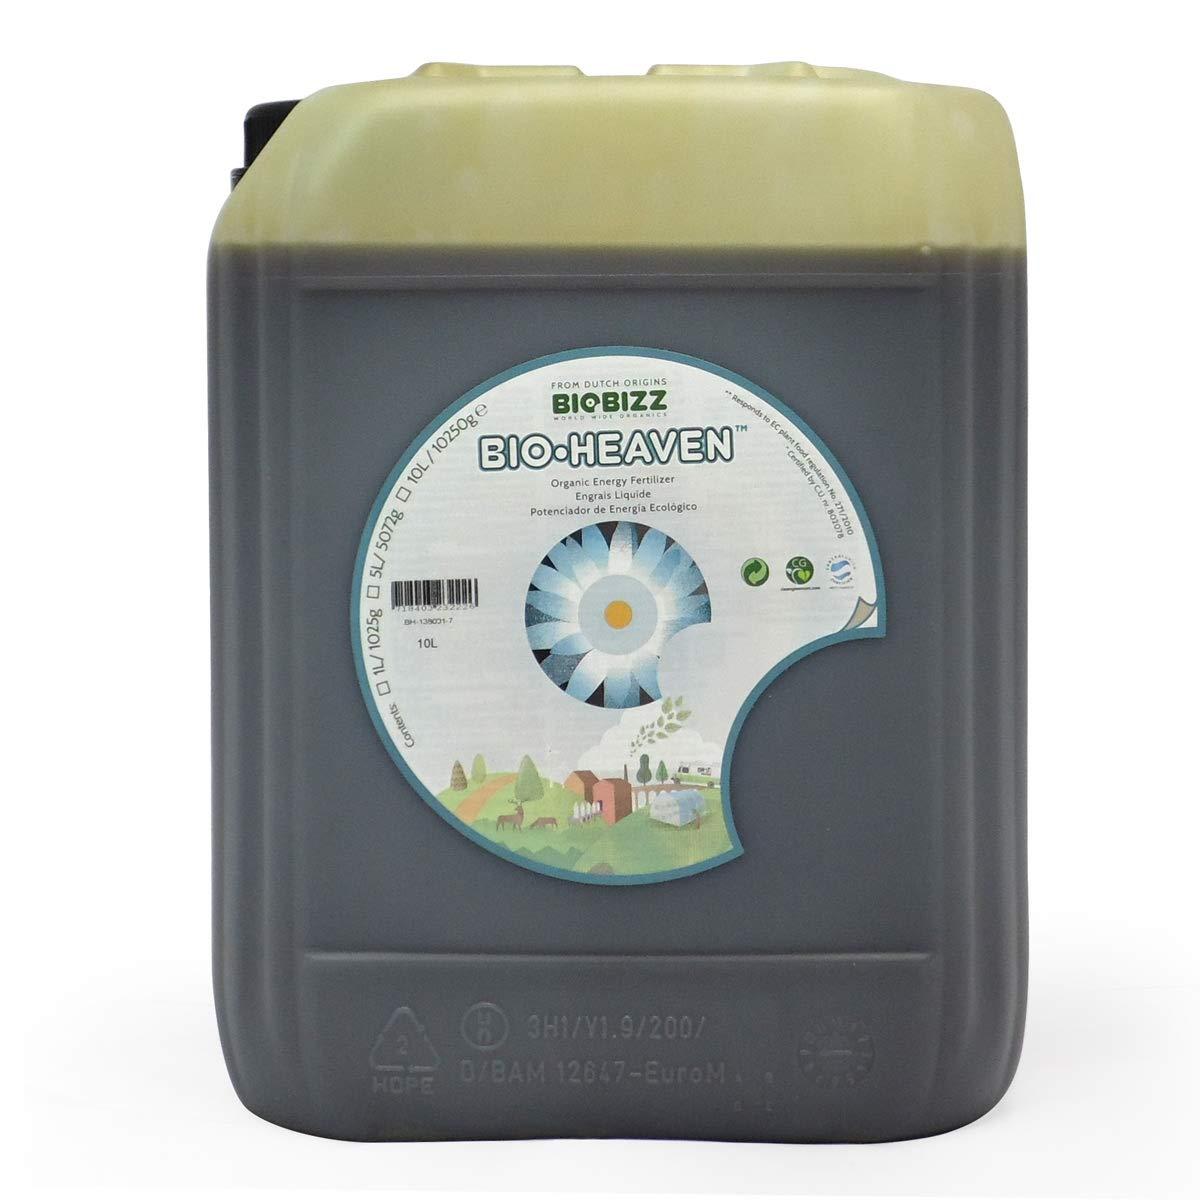 Energisant Bio.Heaven 10 litros - BioBizz: Amazon.es: Jardín